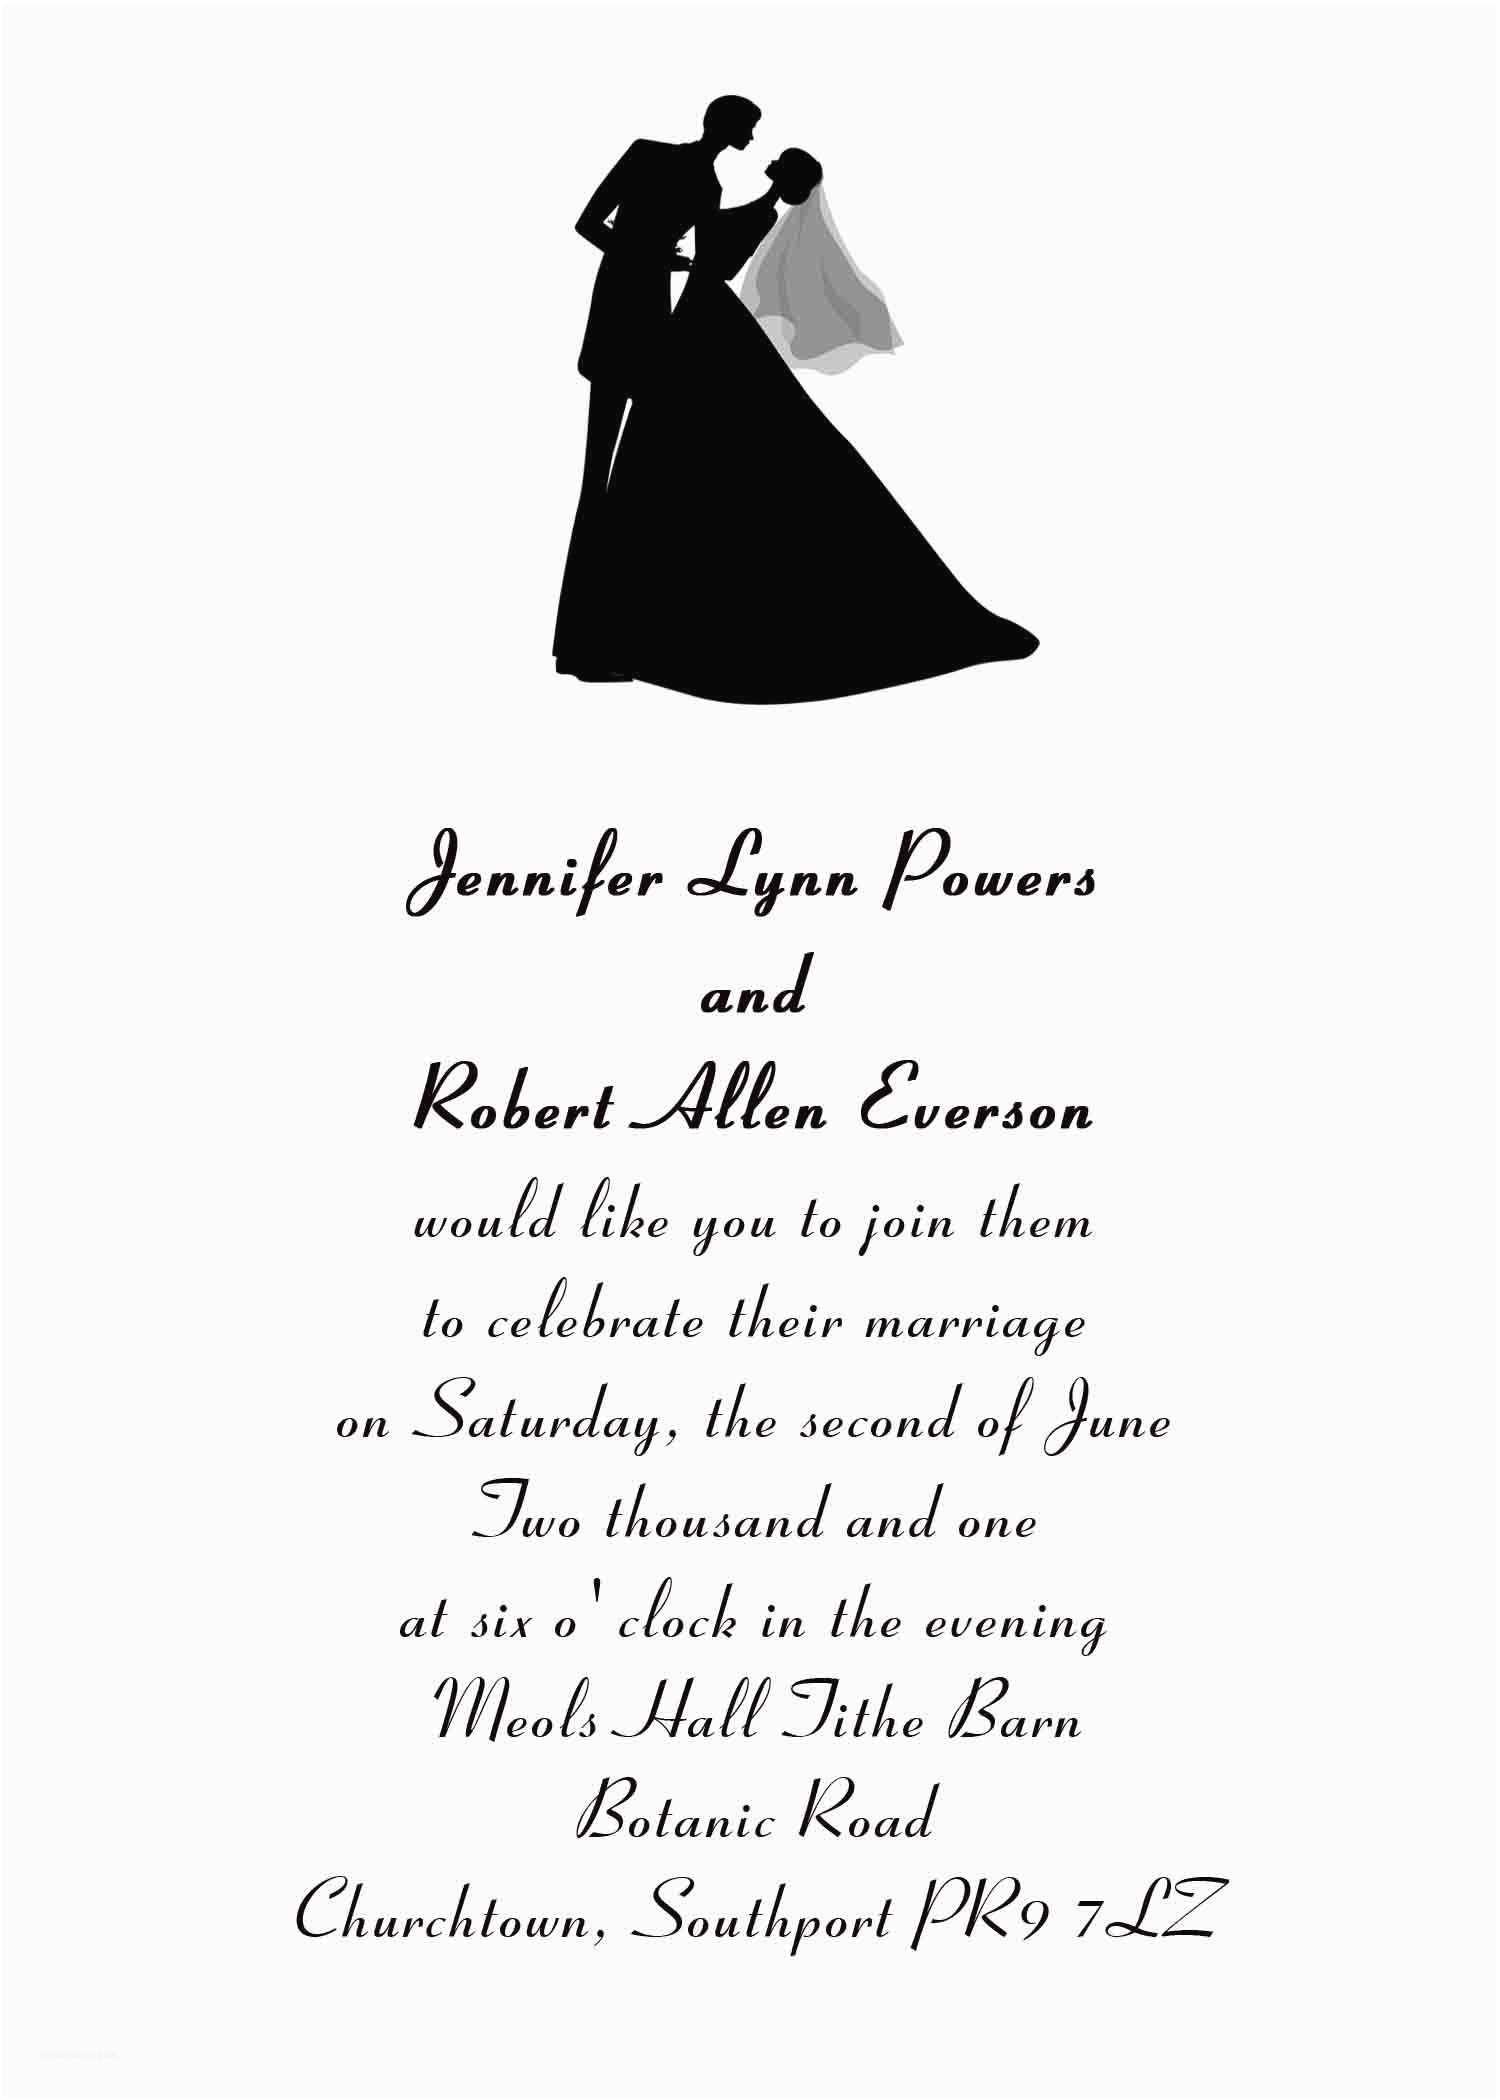 Wedding Invitation Phrases for Friends Wedding Invitation Quotes for Friends Cards Unique Lovable